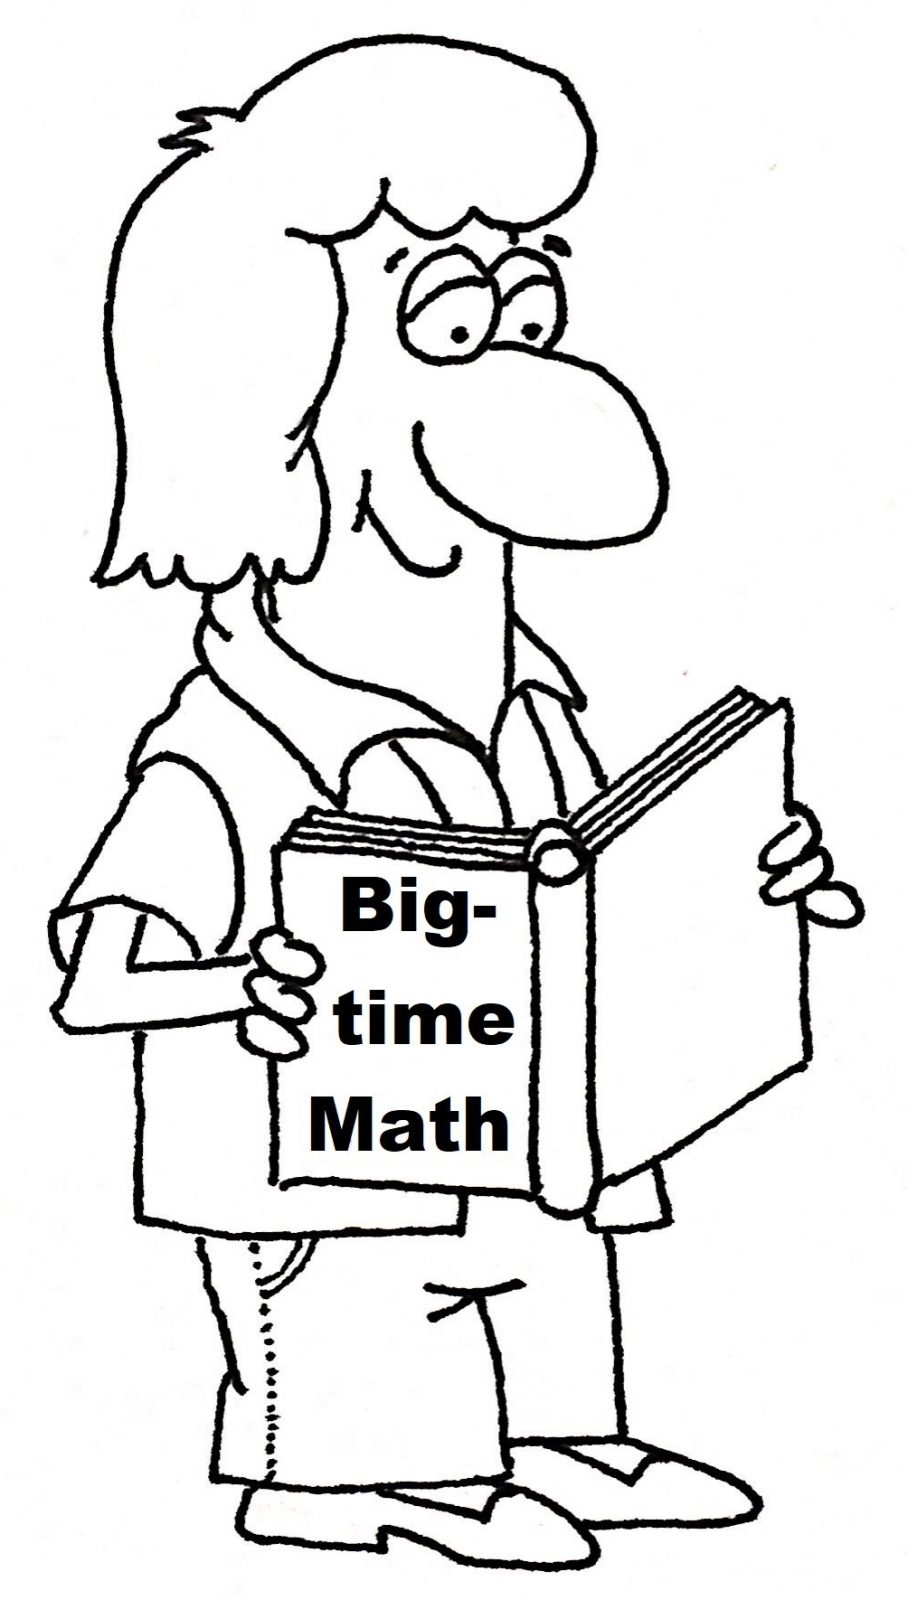 Big-time math